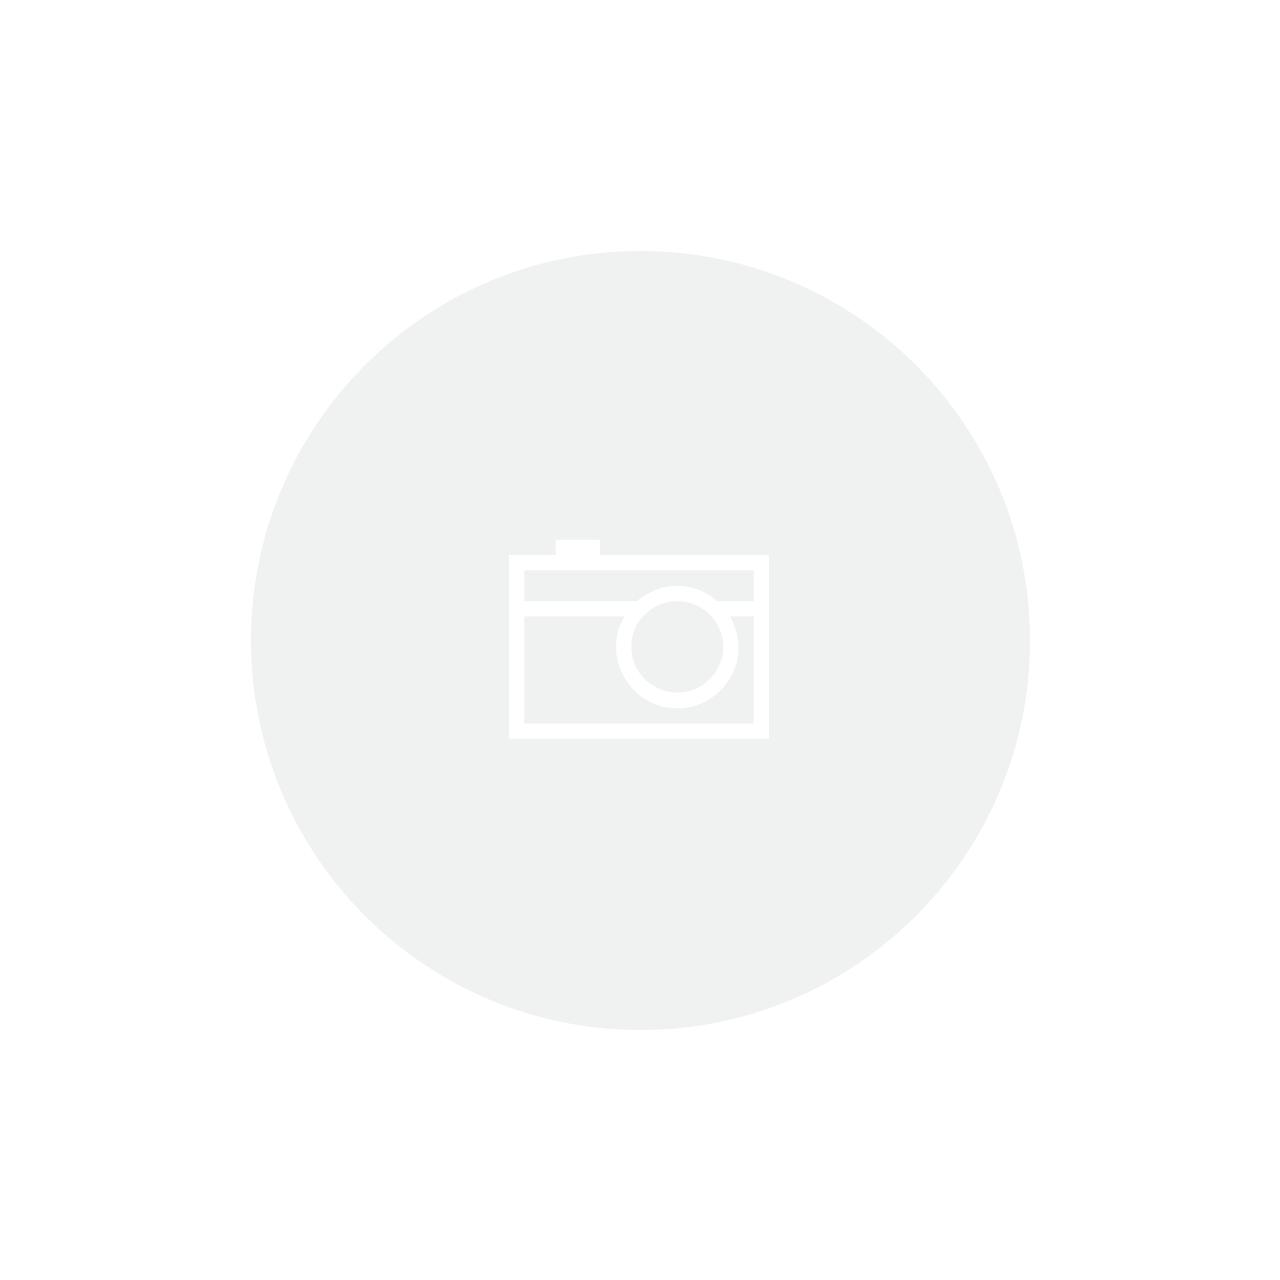 Caçarola Funda Inox 20Cm 3,50 Litros Trix Tramontina